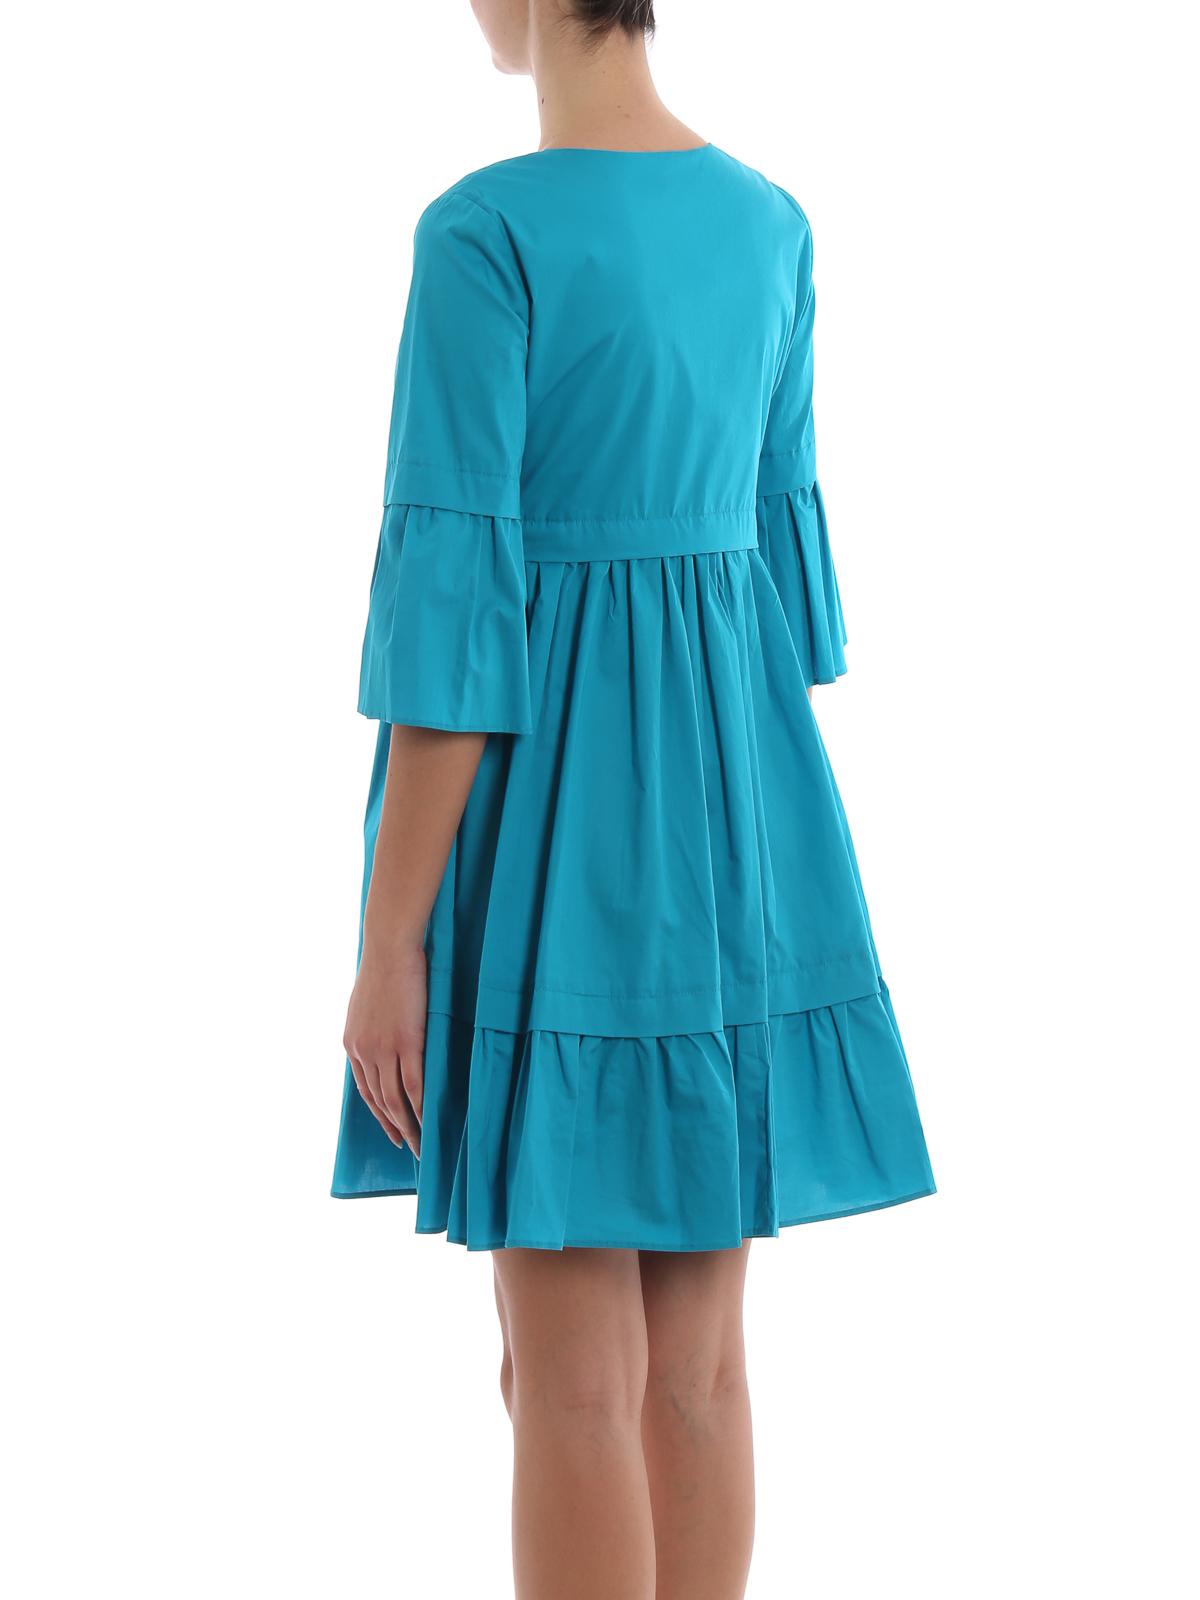 Twinset   Kurzes Kleid   Hellblau   Kurze Kleider   9TT9